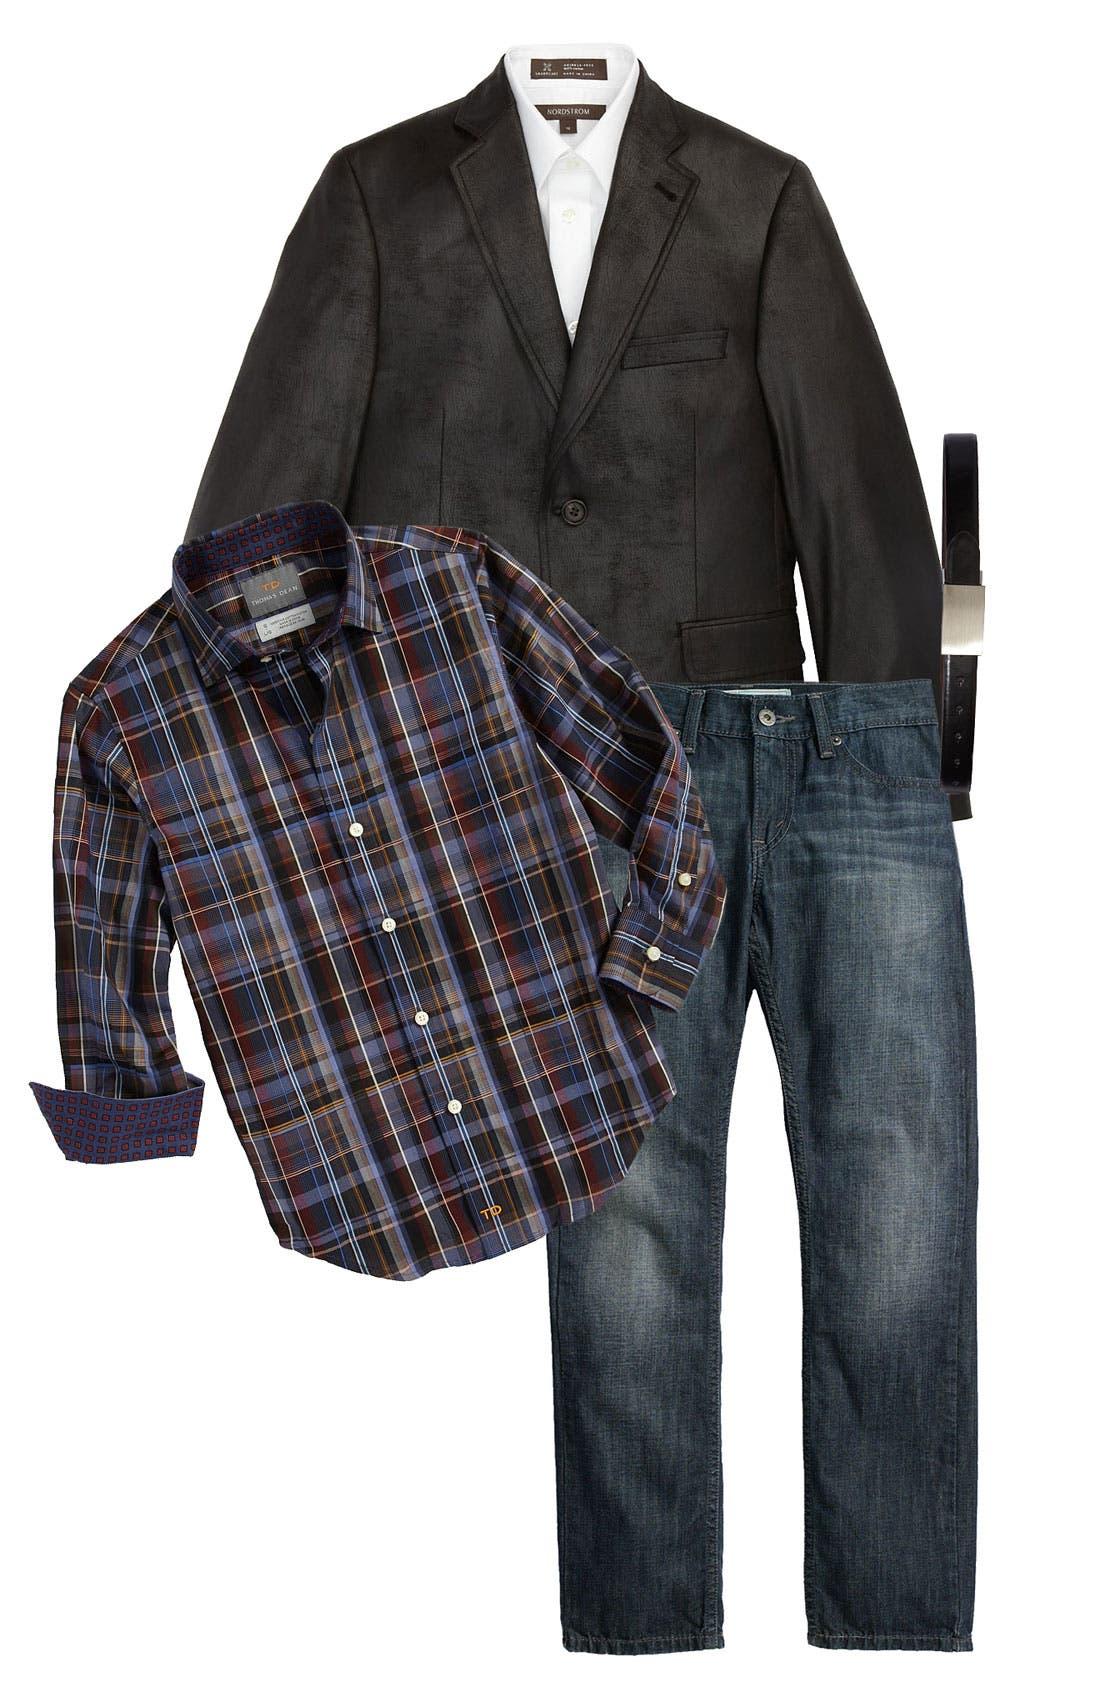 Main Image - Joseph Abboud Blazer, Thomas Dean Dress Shirt & Levi's® Jeans (Big Boys)